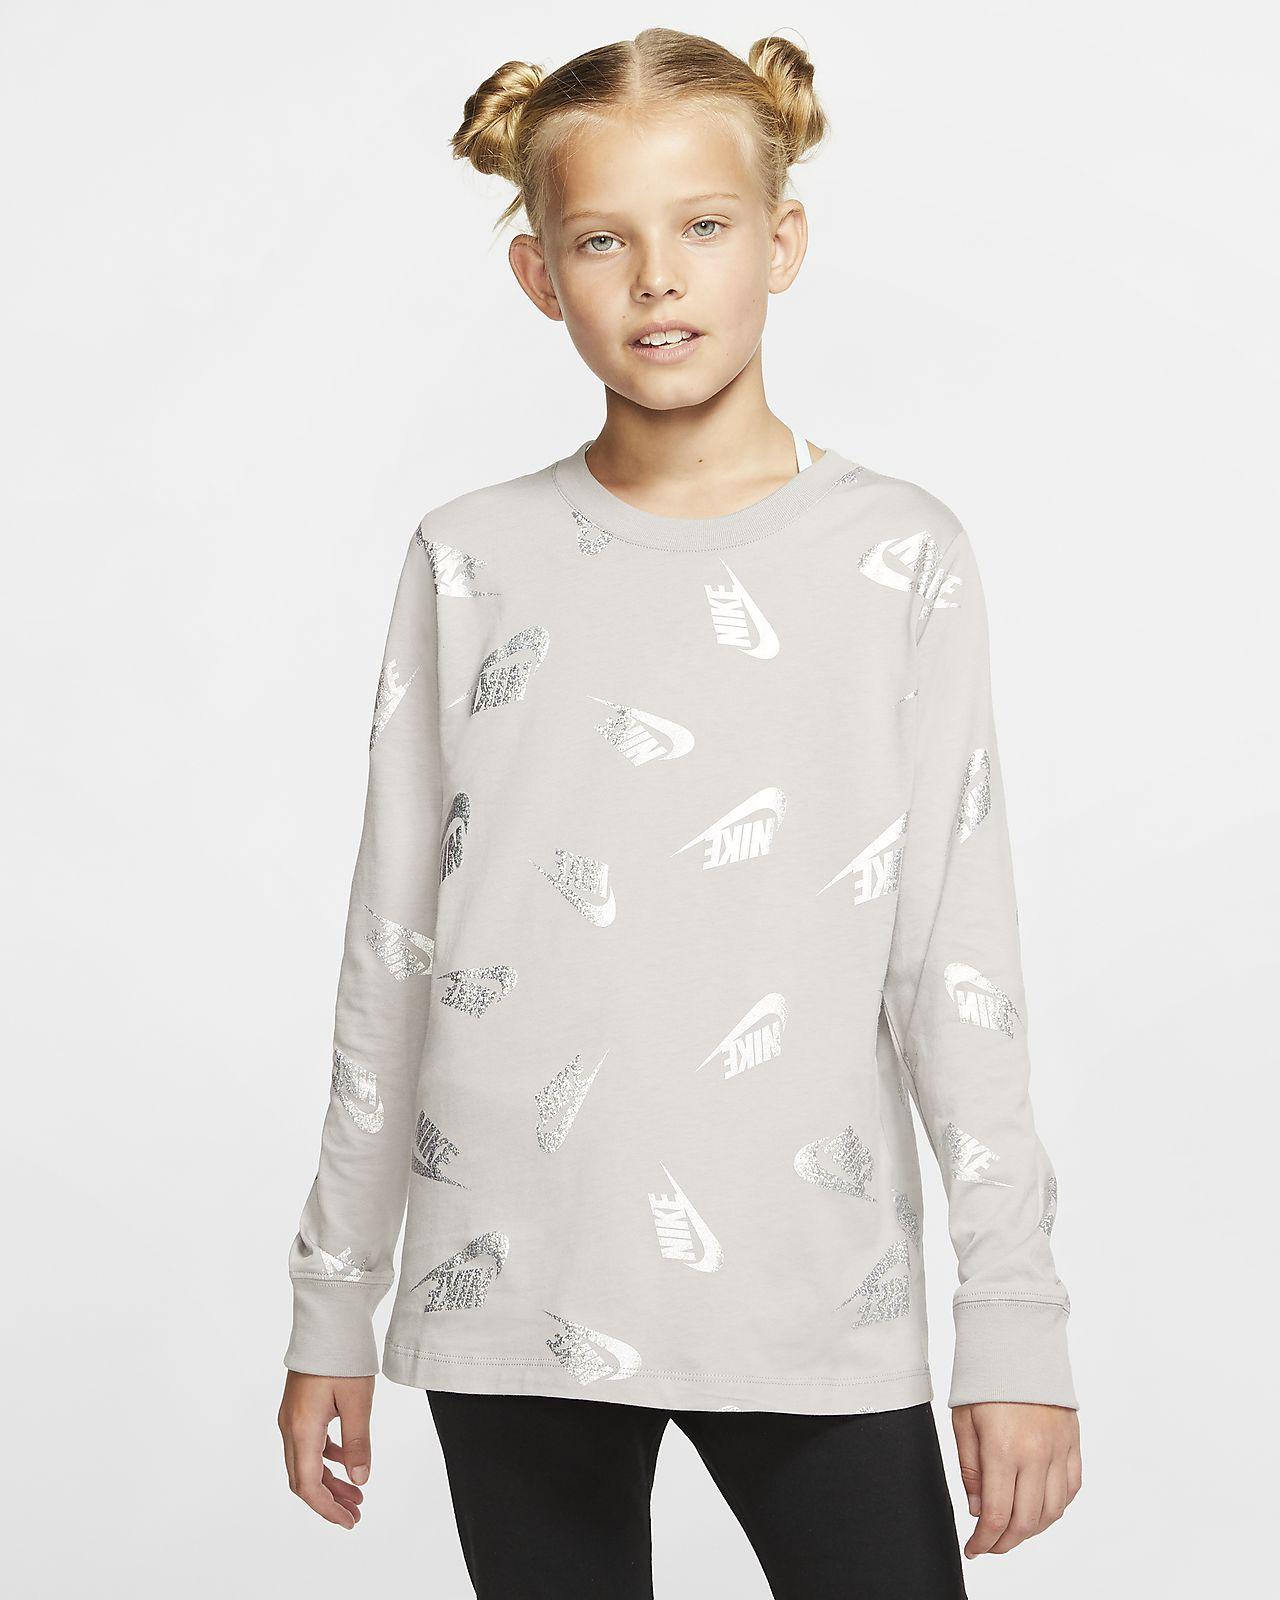 miglior sito web 42f60 7309b T-shirt a manica lunga Nike Sportswear - Ragazzi